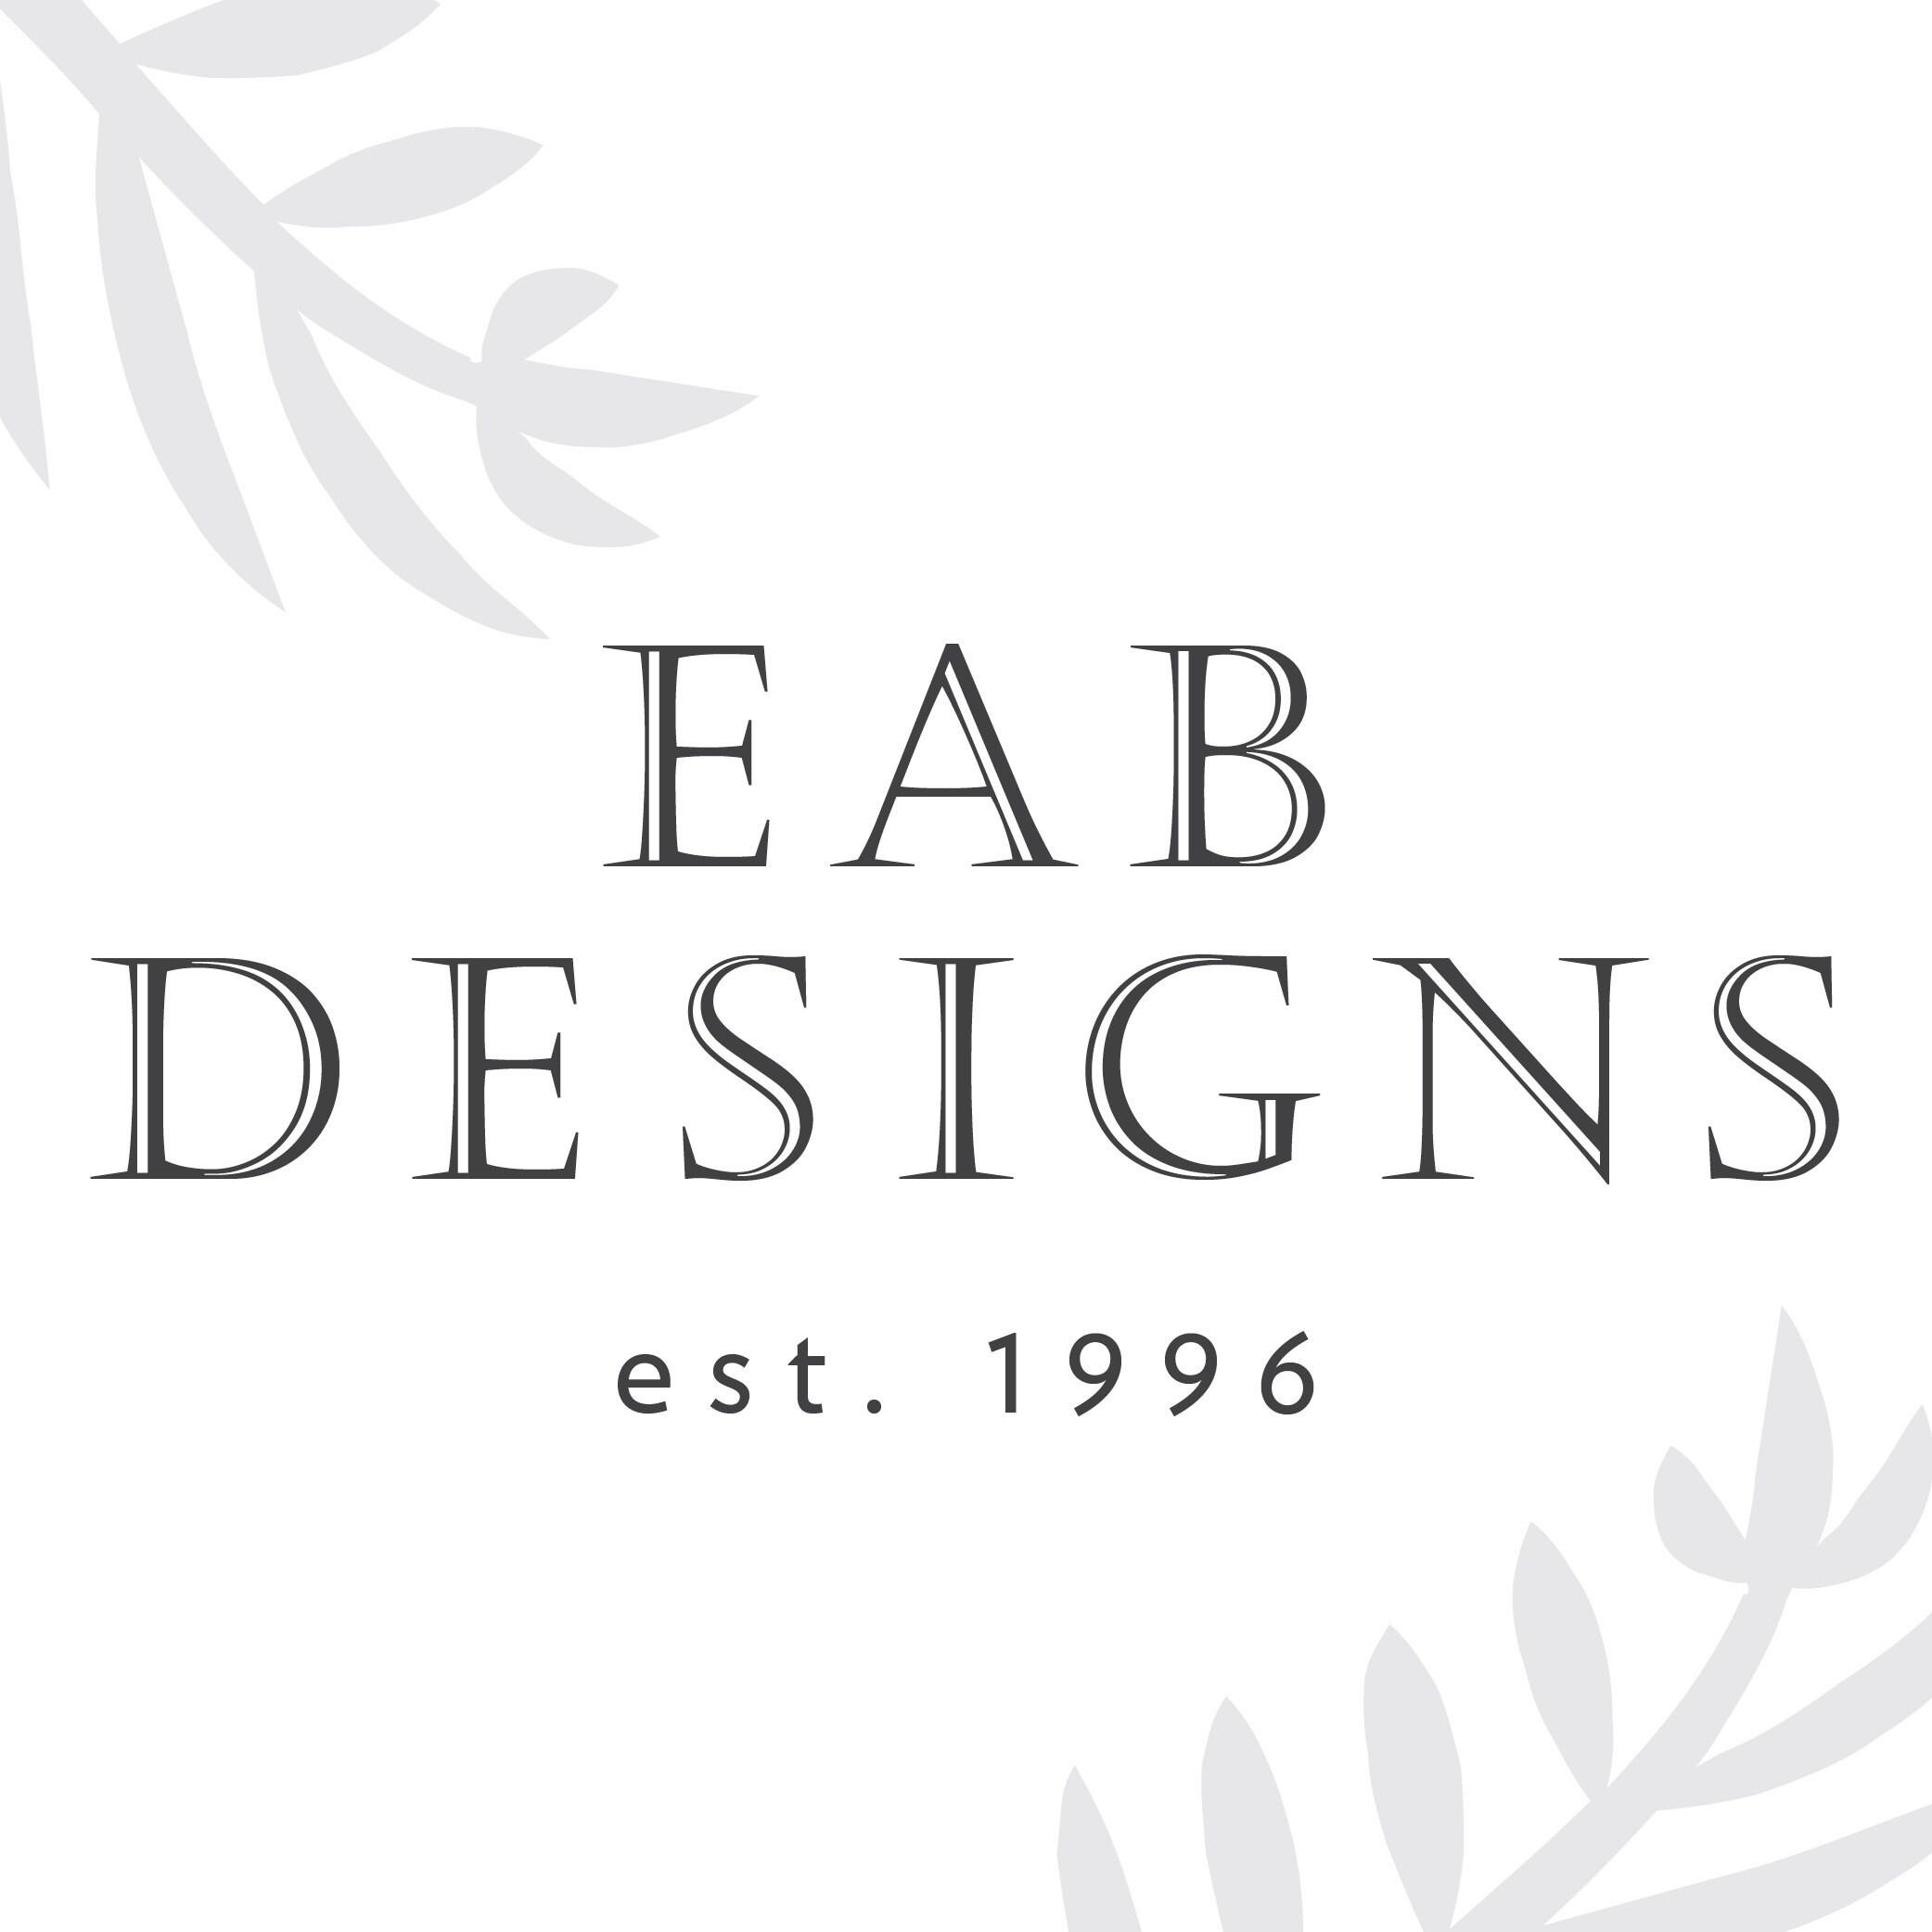 eabdesigns